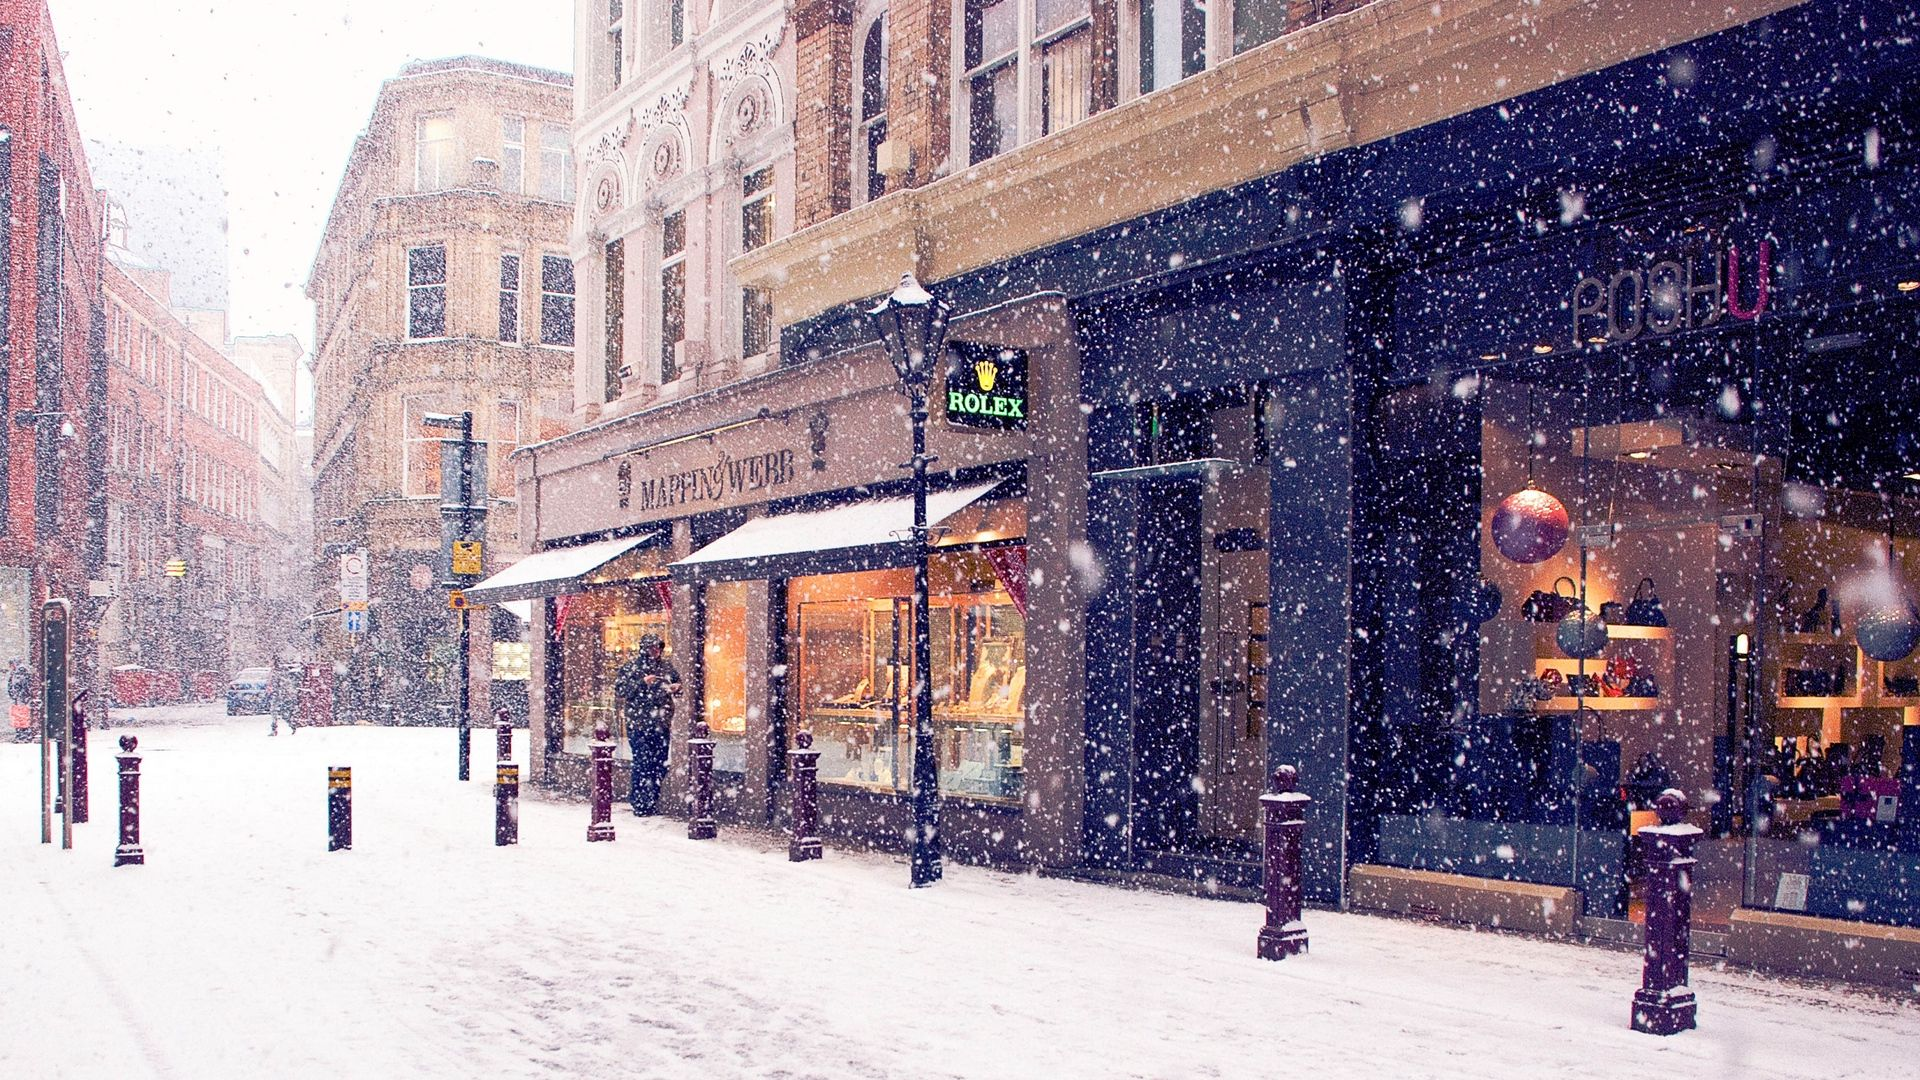 European Winter Wallpapers - Top Free ...